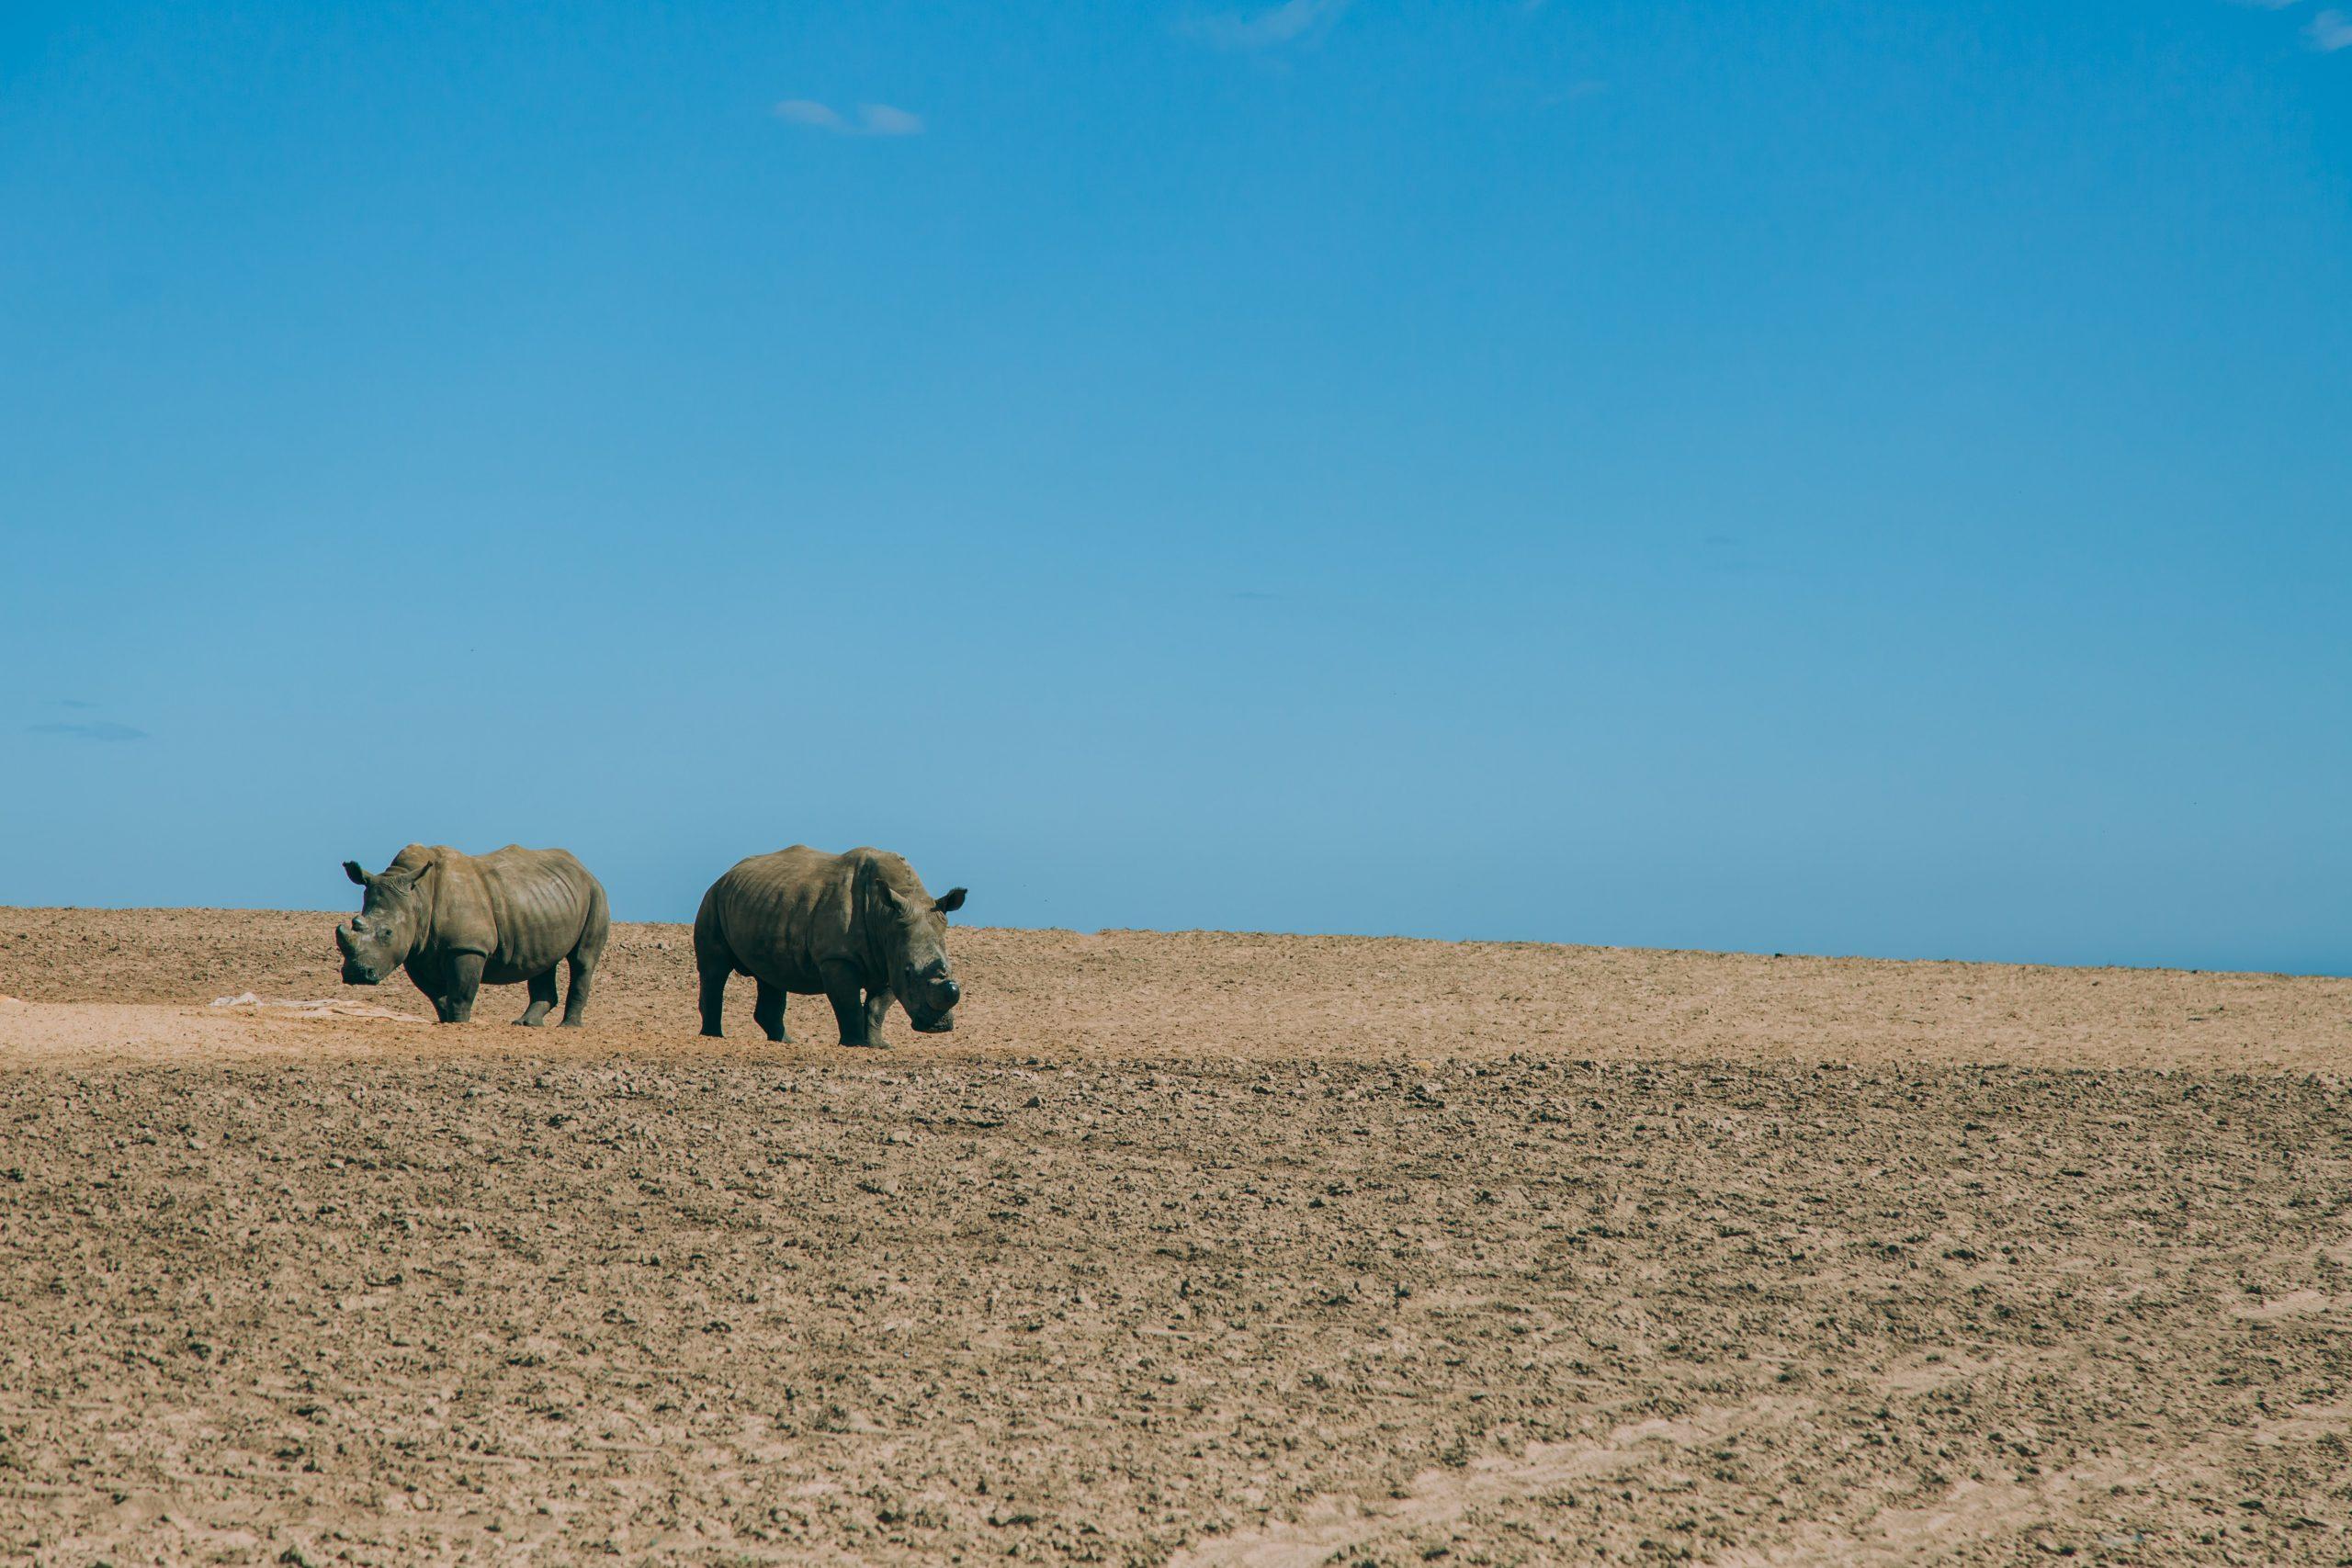 Buffelsfontein Game Reserve